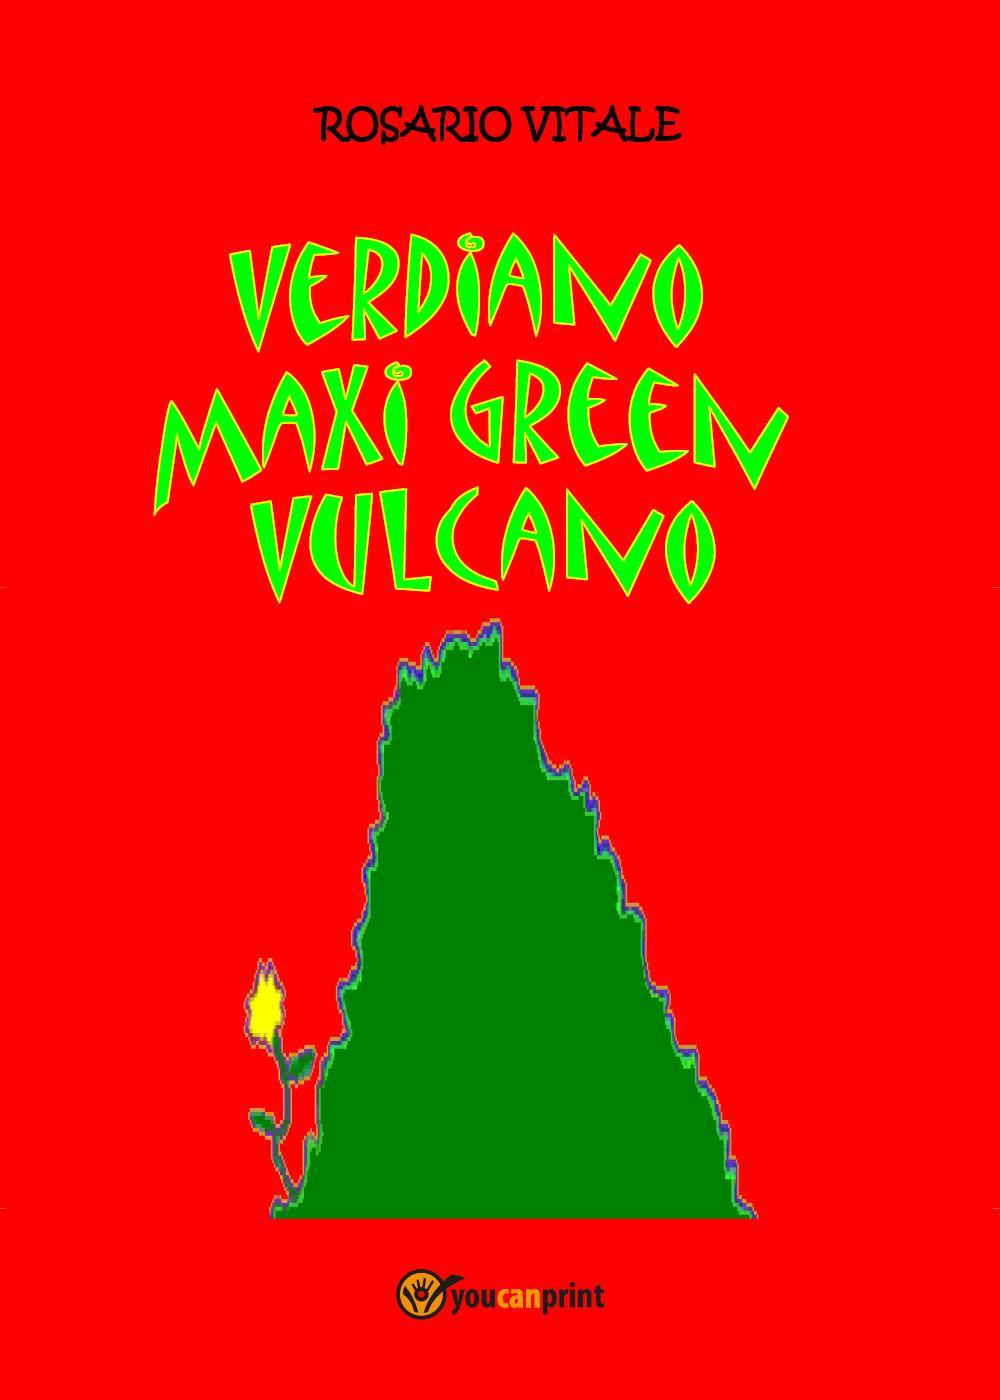 Verdiano Maxi Green Vulcano